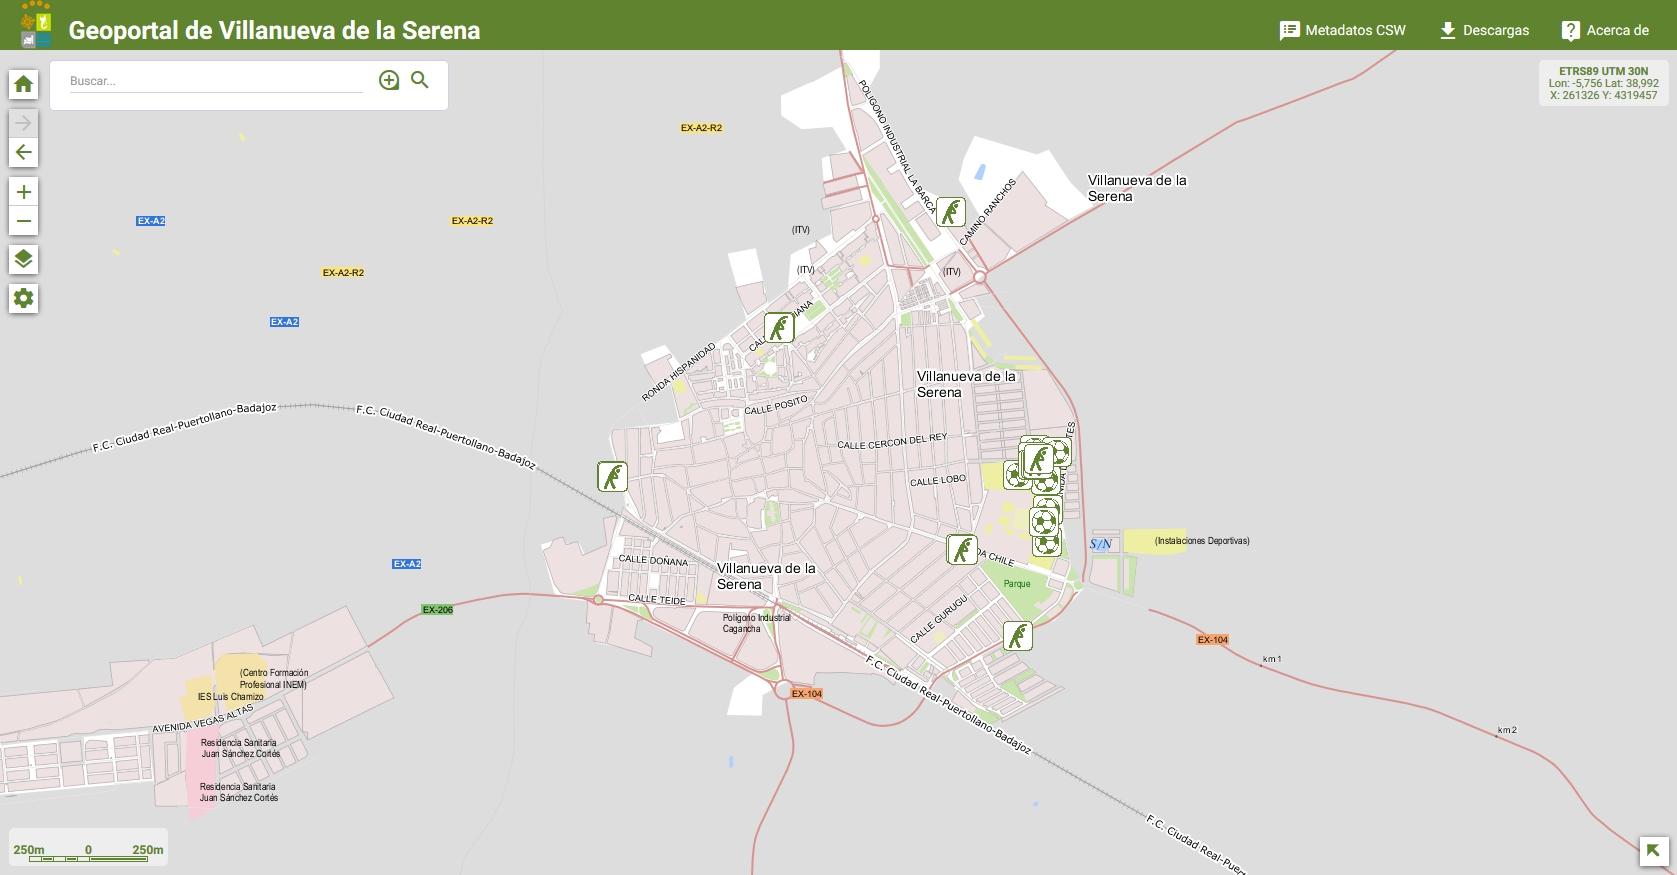 Deportes - Mapa de Deportes